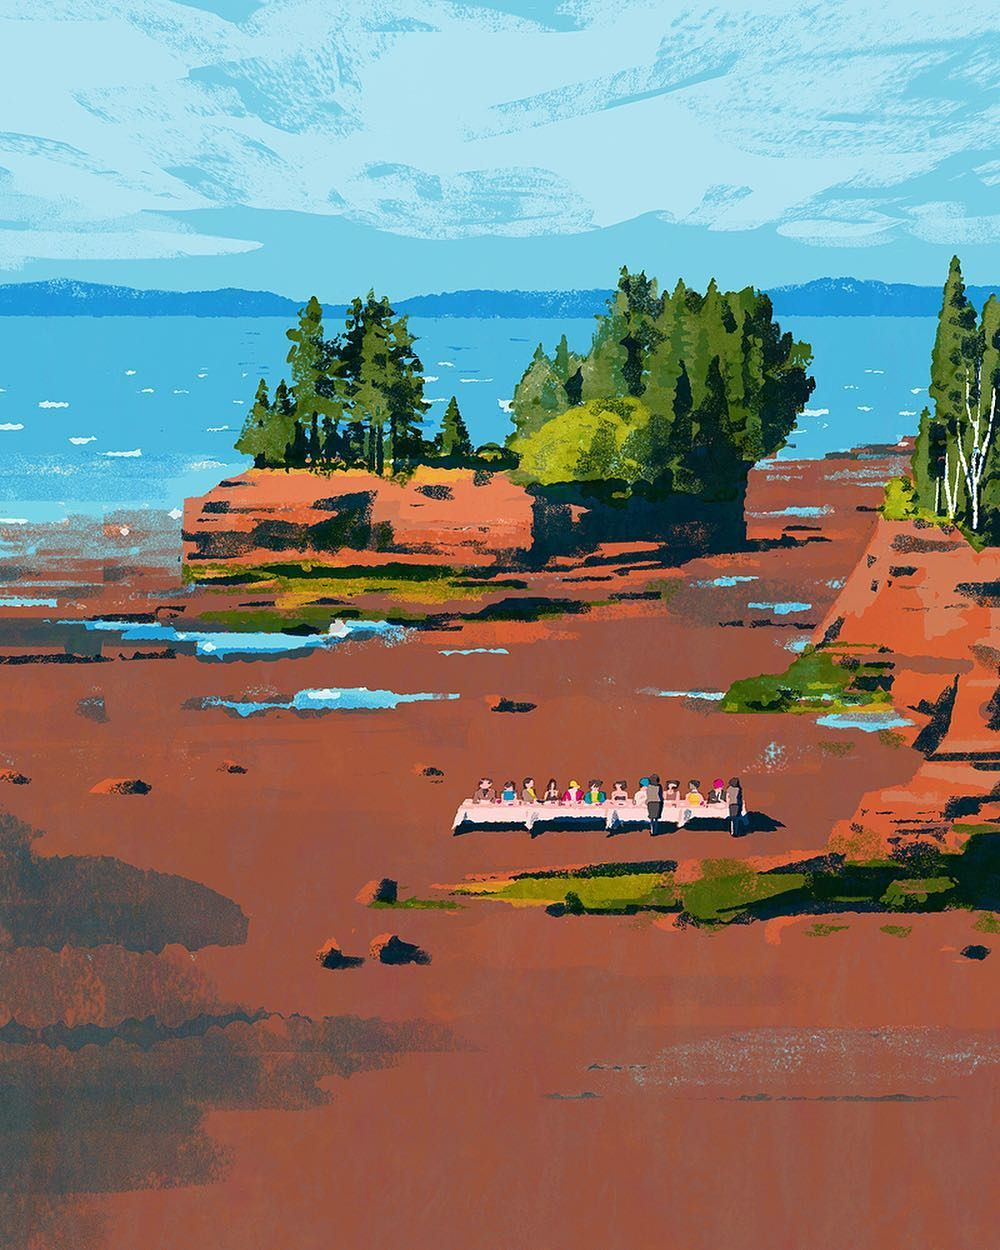 Nova Scotia #illustration #illustrator #tatsurokiuchi #art #drawing #life #lifestyle #happy #japan #people #木内達朗 #イラスト #イラストレーション